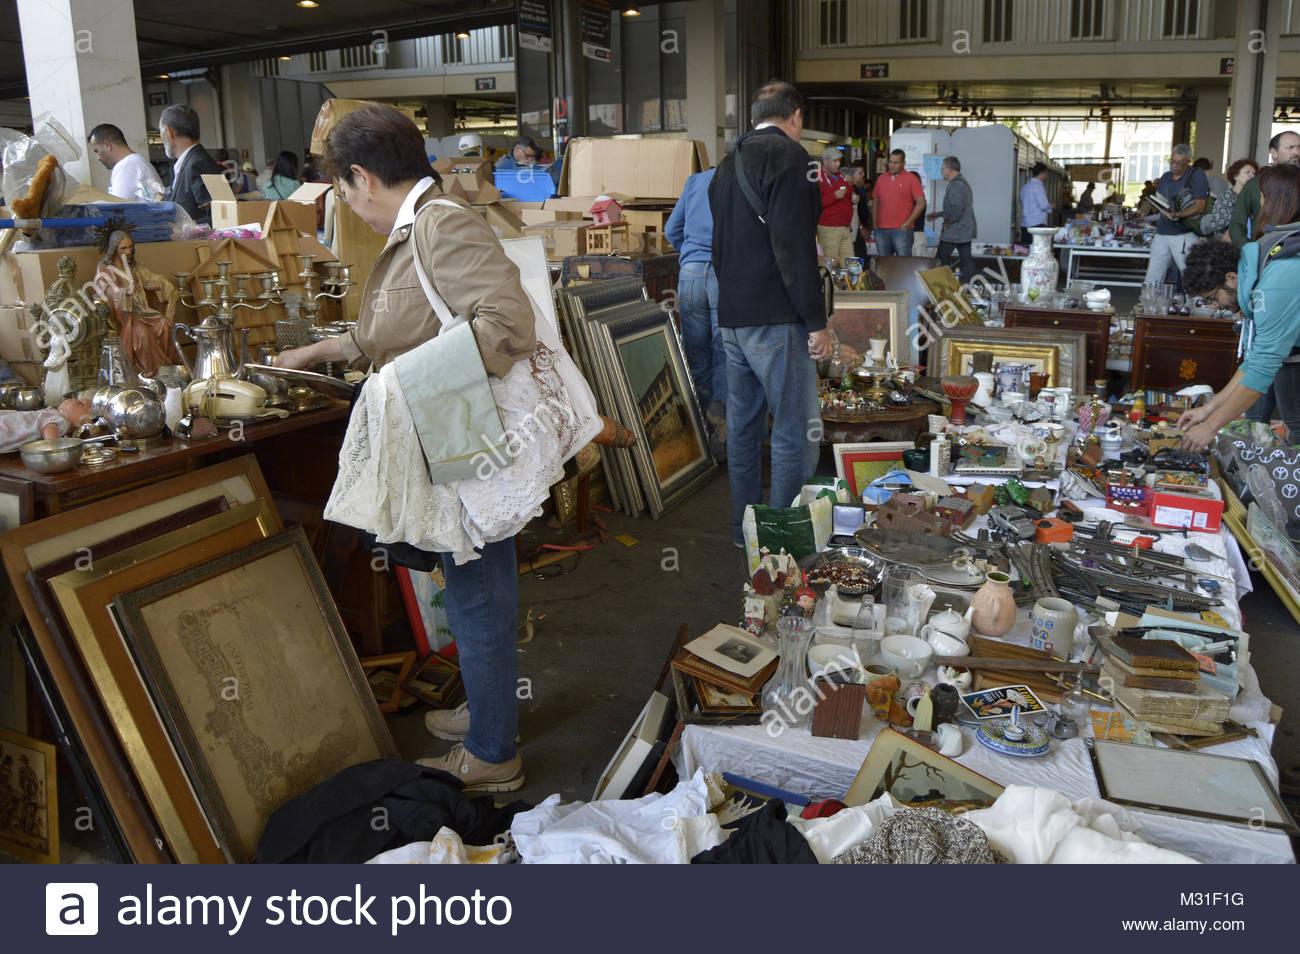 Mercat dels Encants flea market in Barcelona Spain Europe - Stock Image